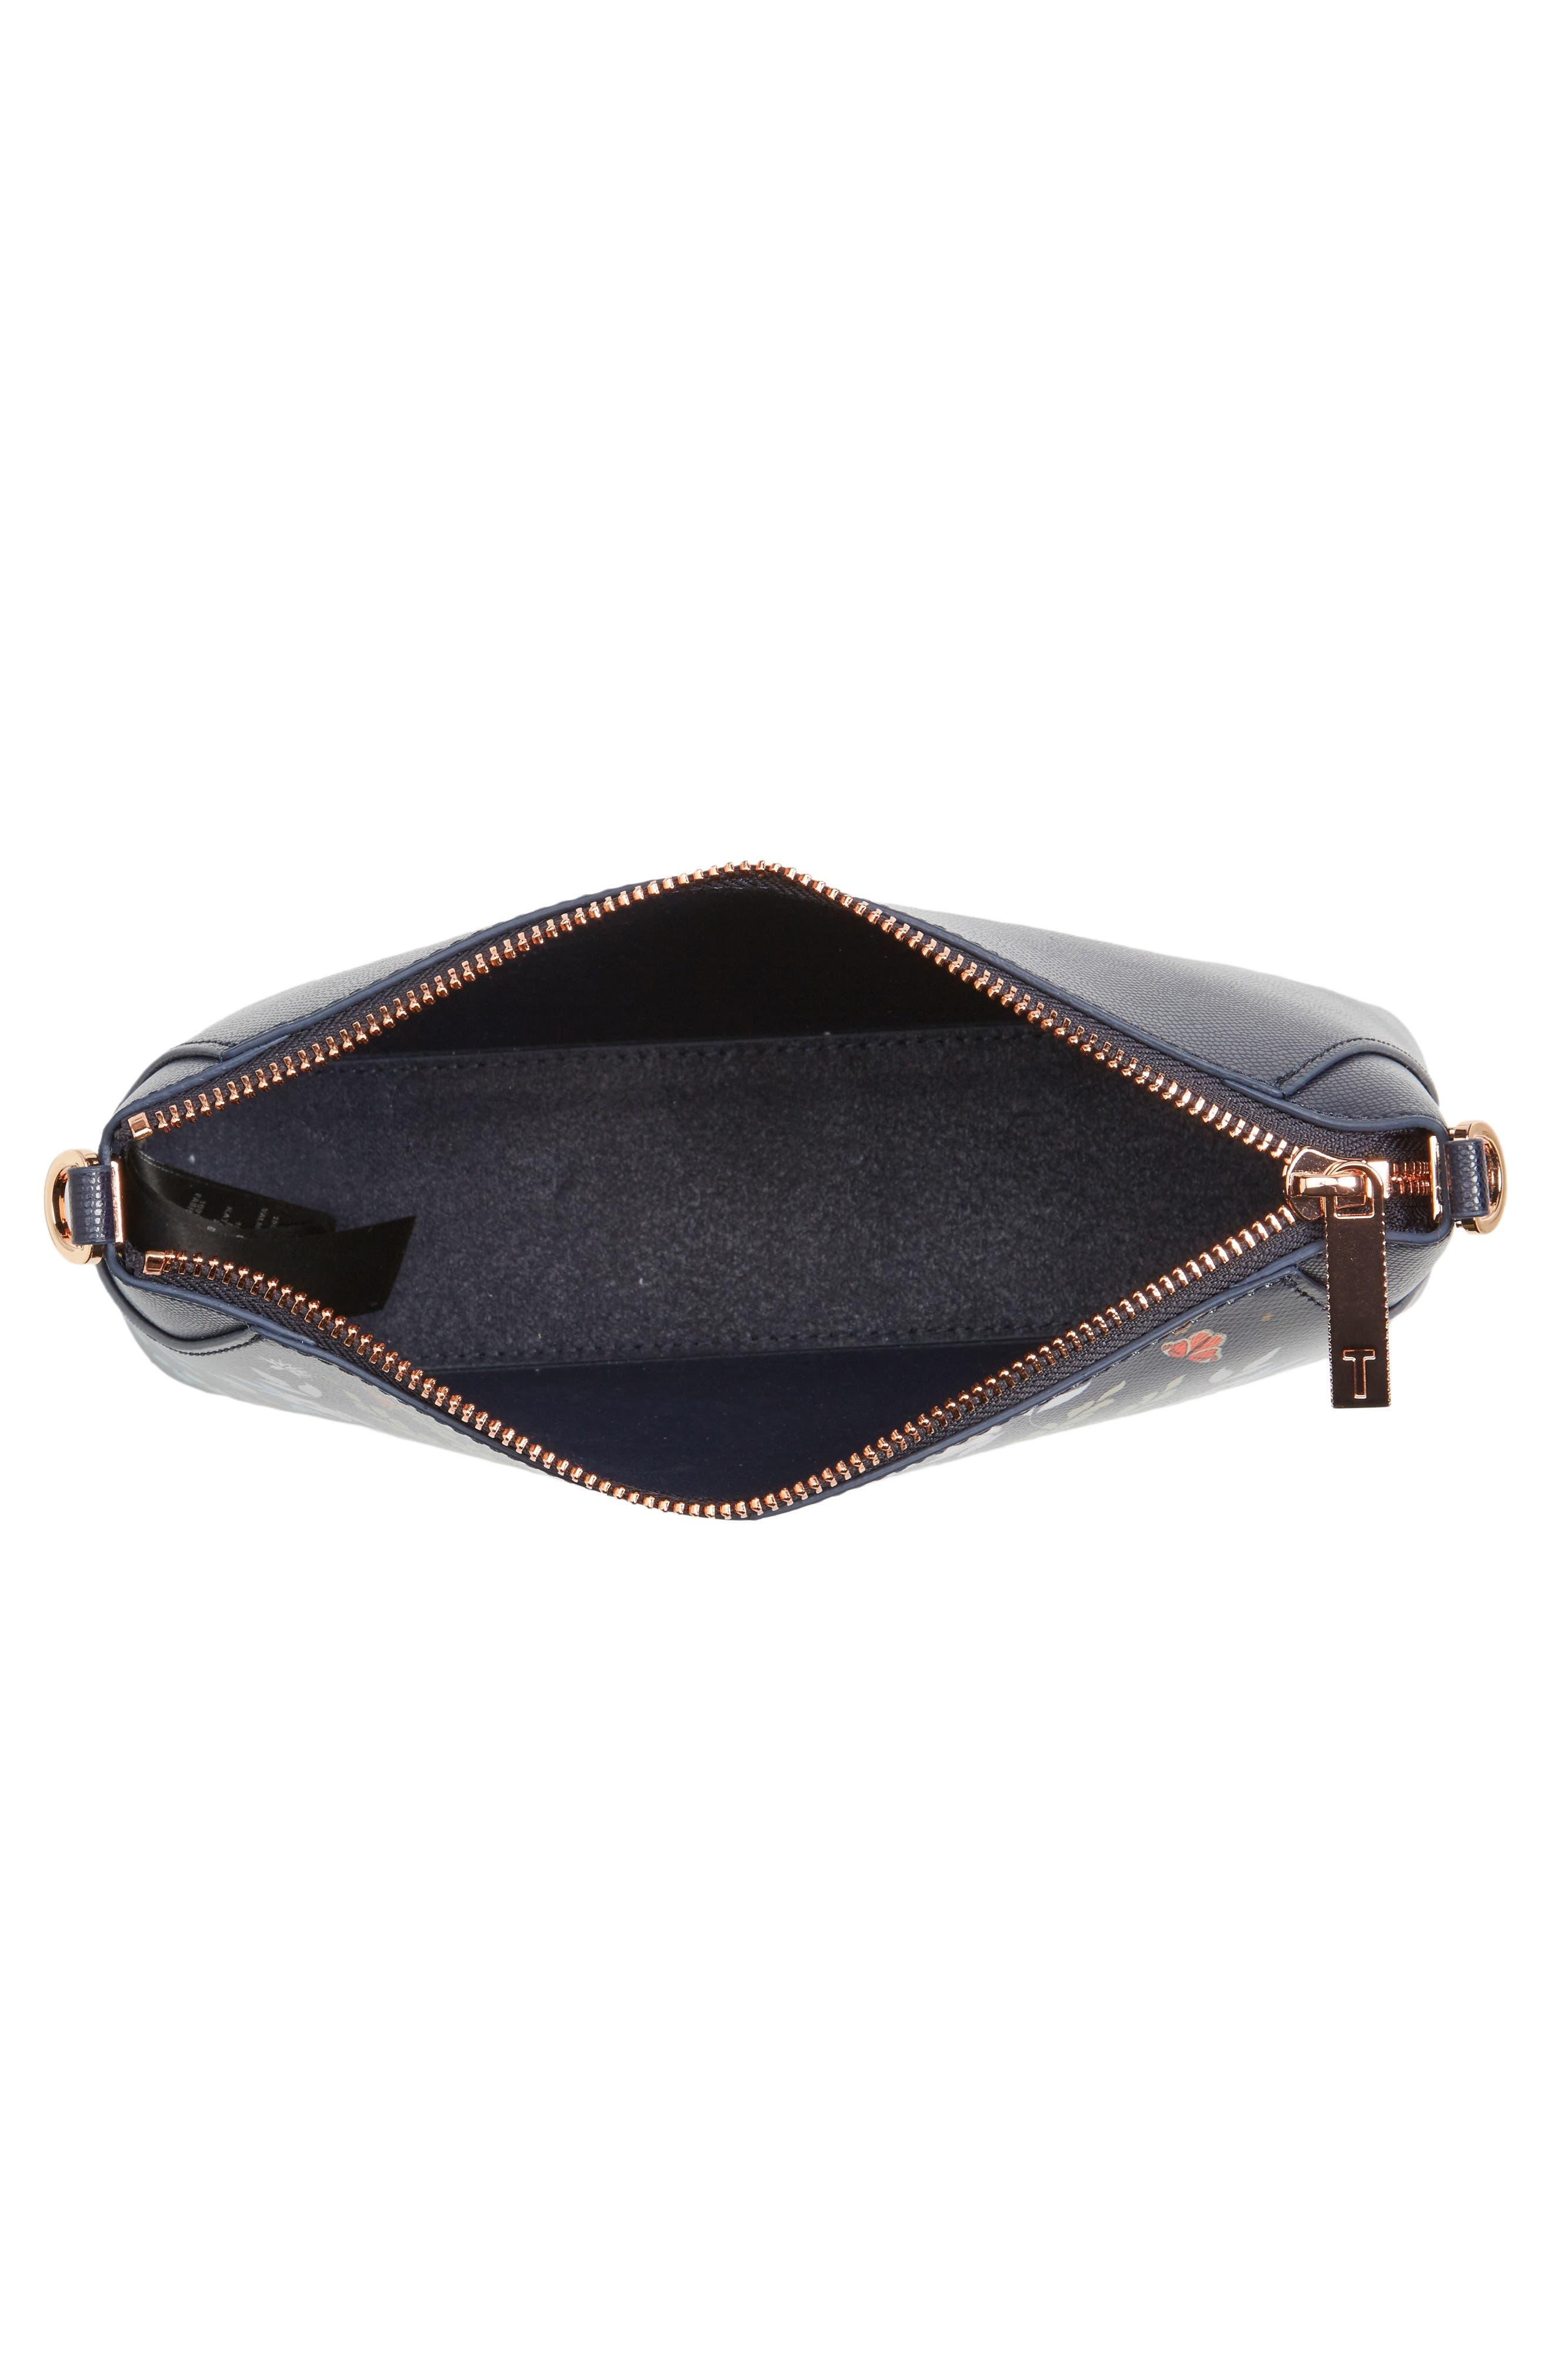 Marisiaa - Kyoto Gardens Leather Crossbody Bag,                             Alternate thumbnail 4, color,                             424